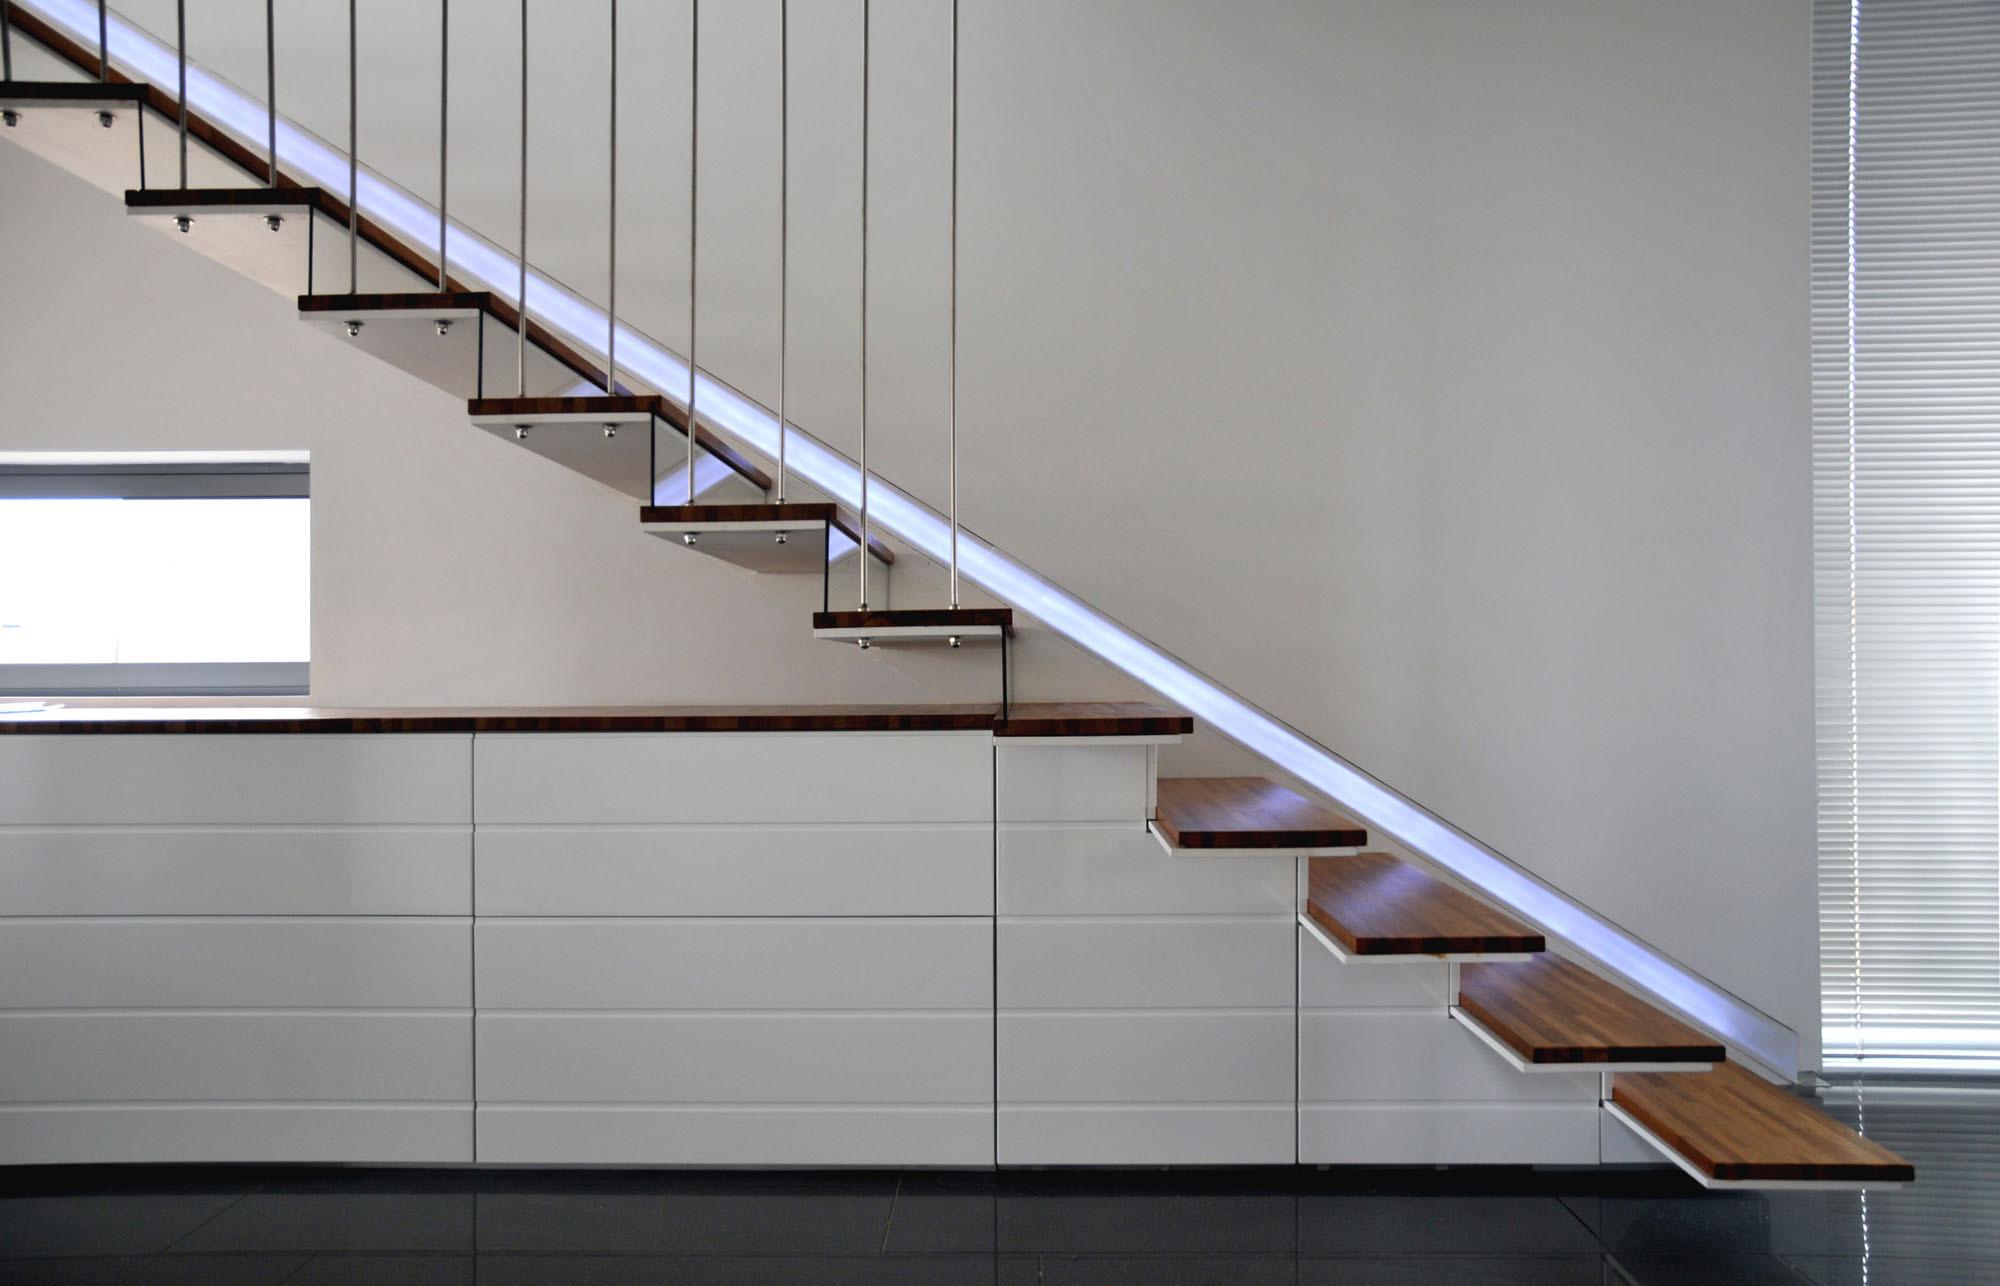 House 0214 / Simpraxis Architects